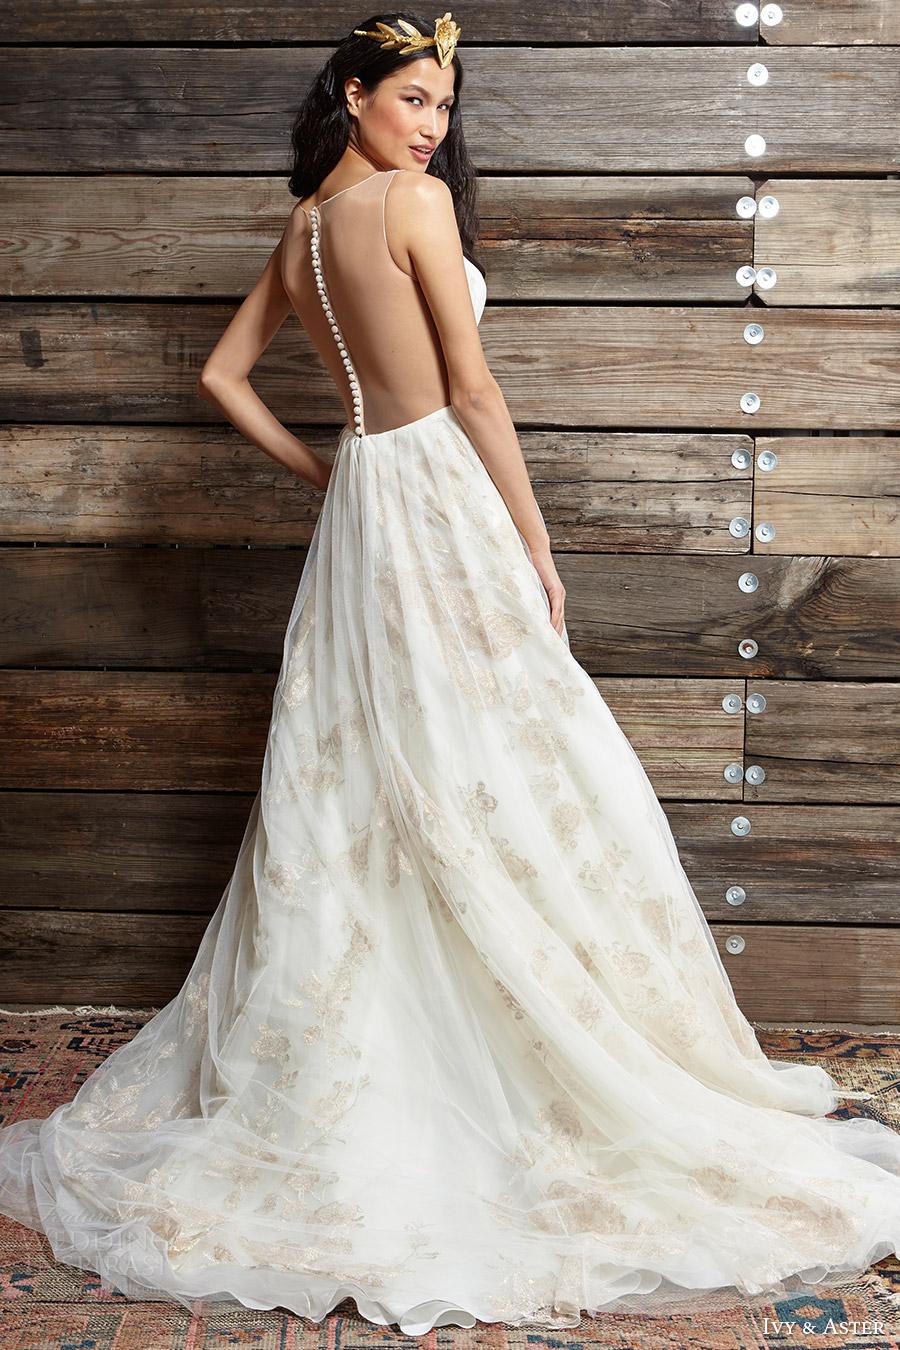 ivy aster bridal spring 2017 sleeveless deep vneck ball gown wedding dress (cherry blossom) bv